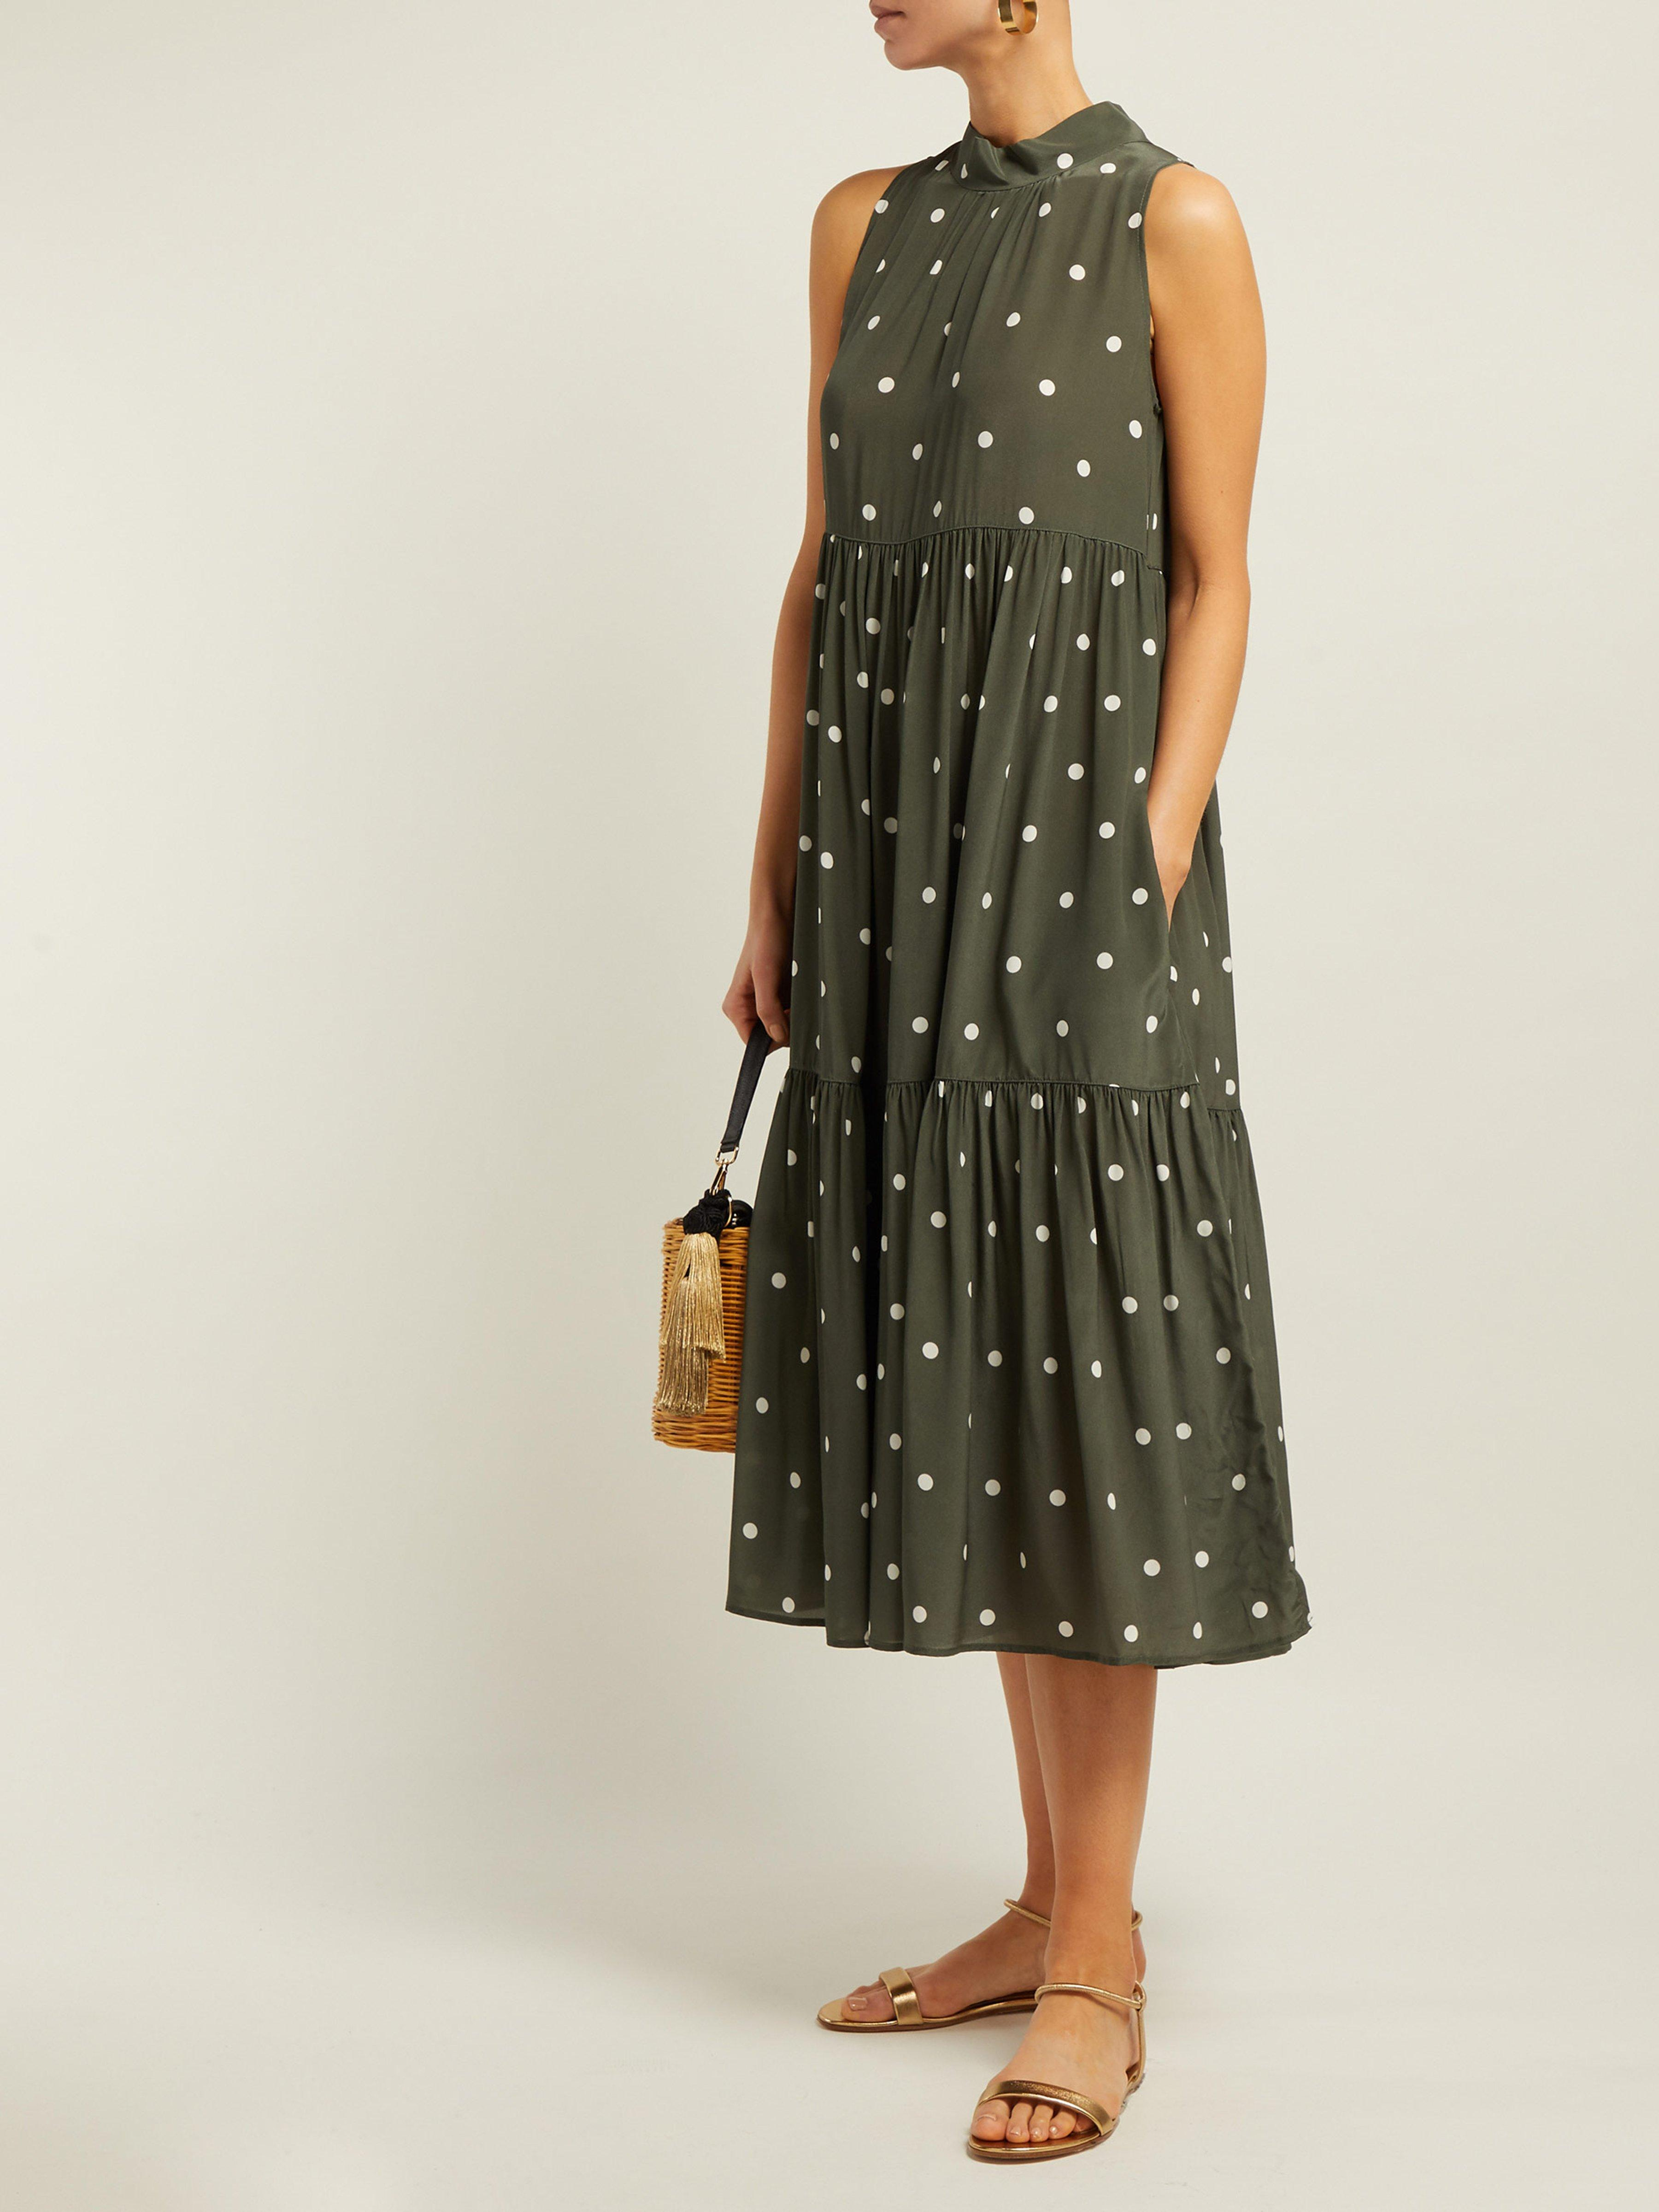 Asceno Dress Midi Silk Lyst Save 19 In Tiered Dot Crepe Polka Green rwYqHafr